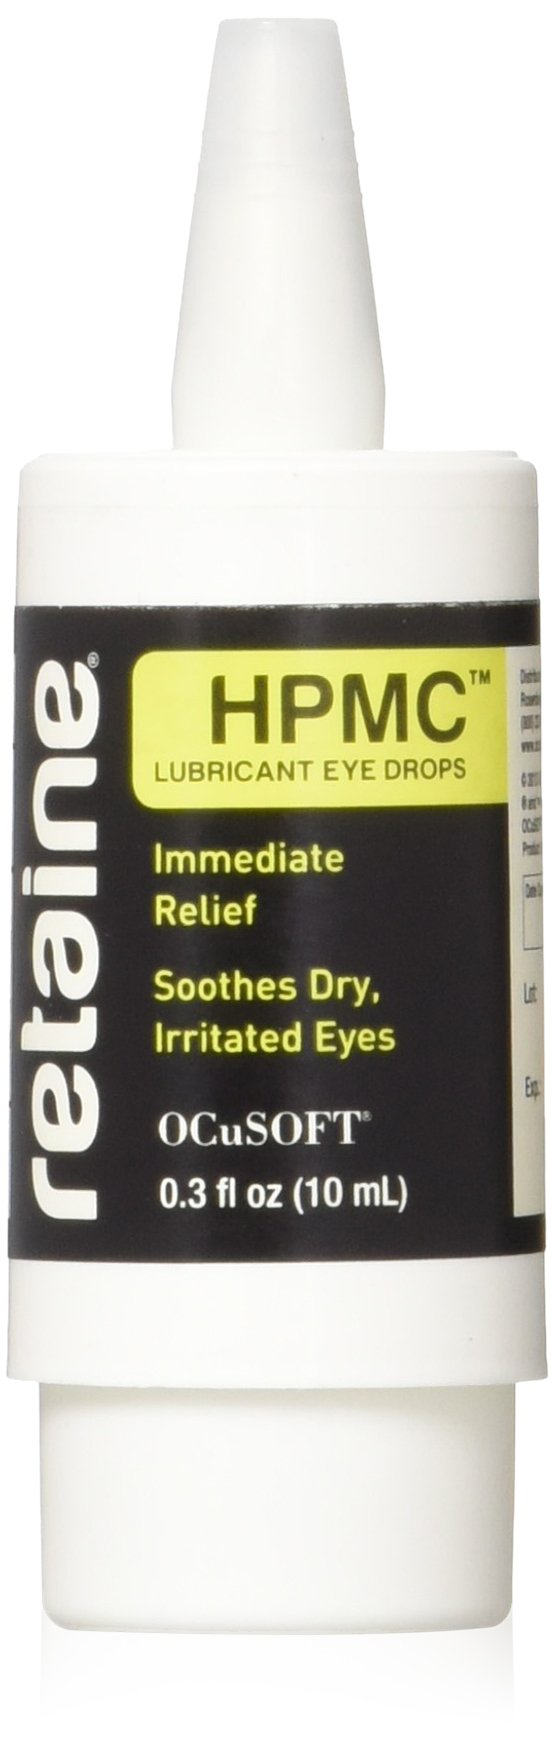 OCuSOFT Retaine HPMC 10 Milliters, Preservative-Free Lubricant Eye Drops